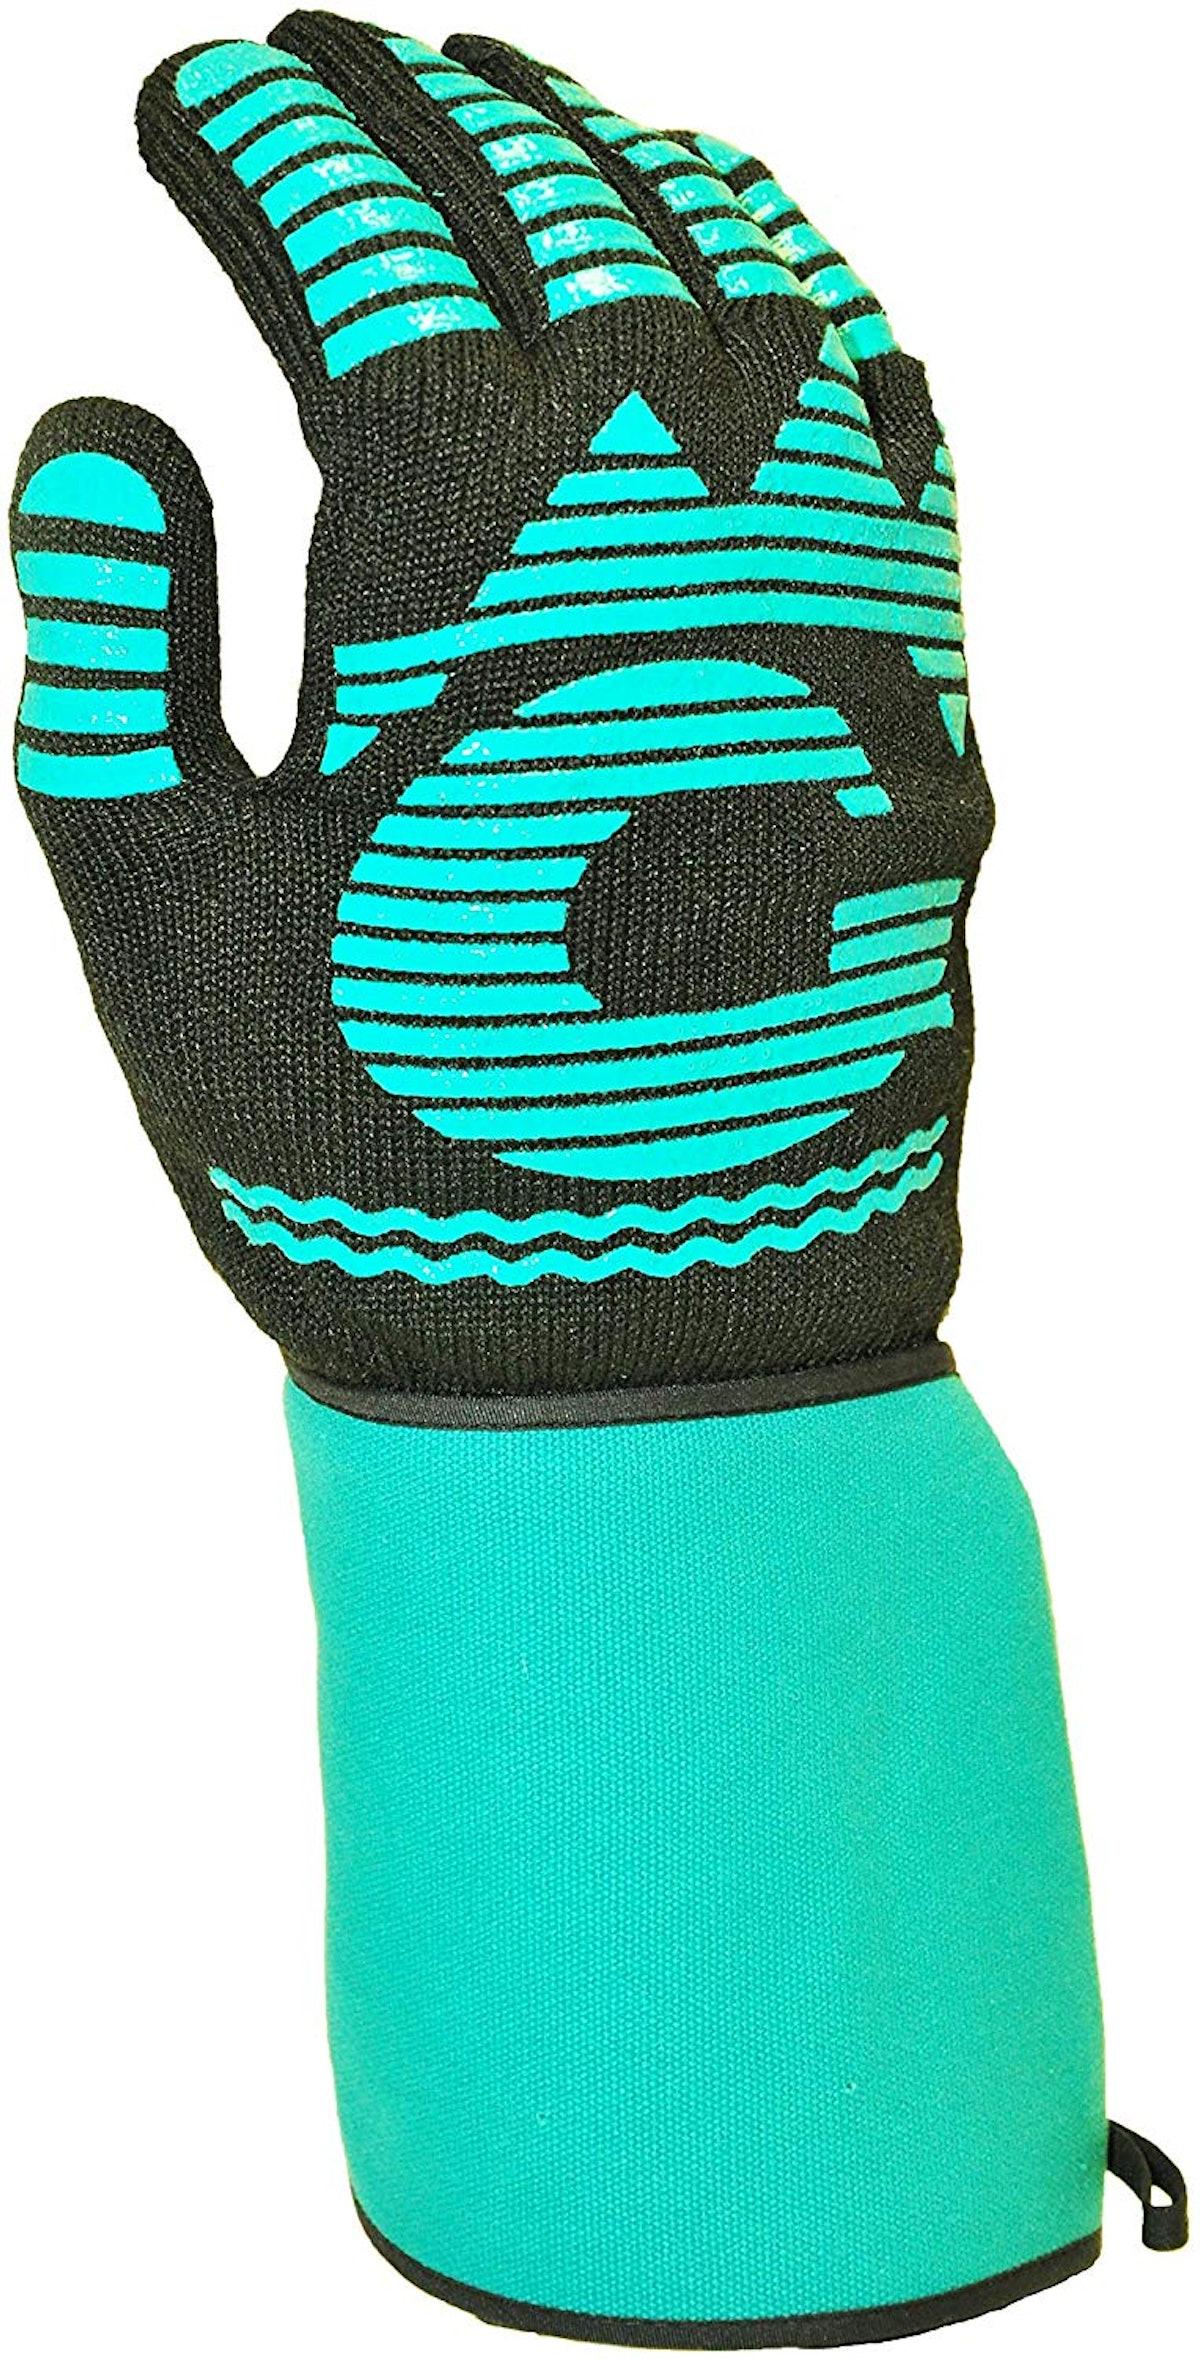 G & F Heat Resistant BBQ Grilling Glove